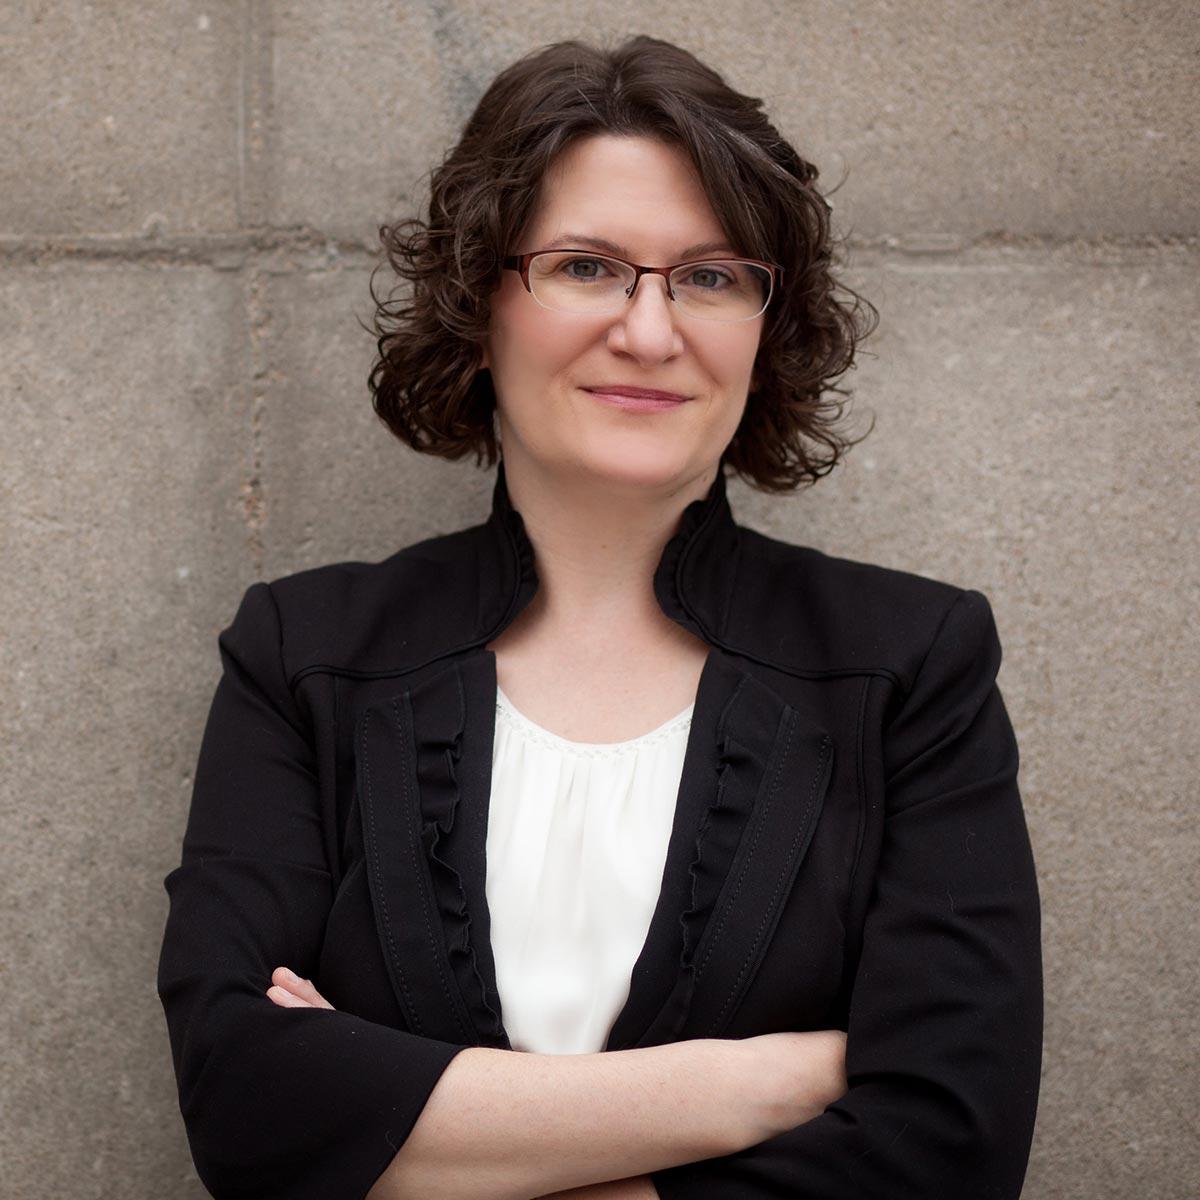 Sarah Kovaleski